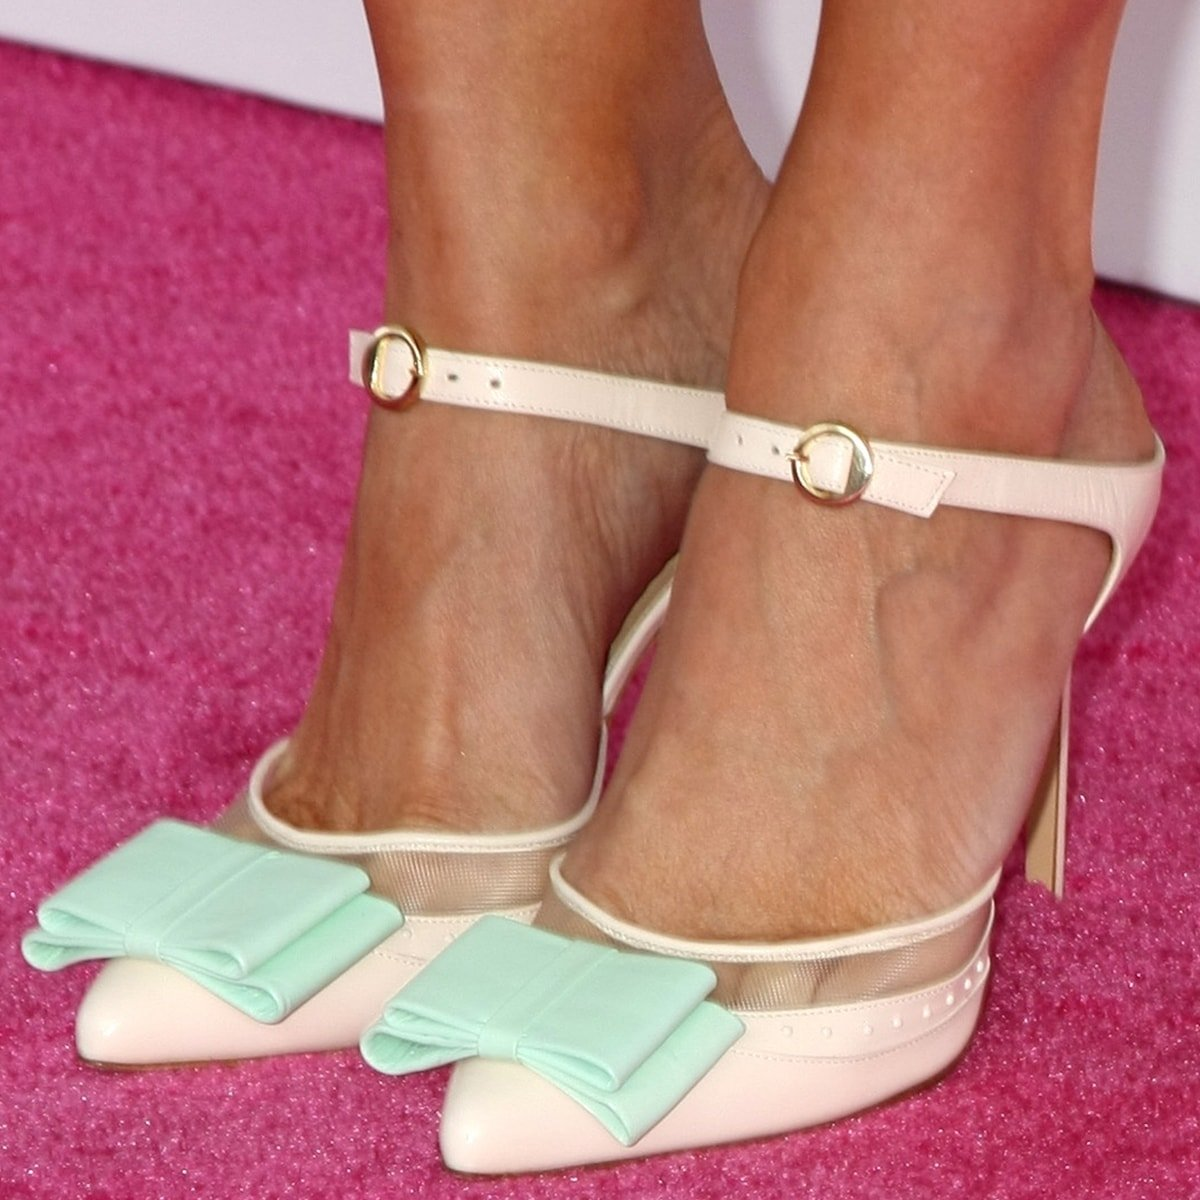 Kristen Wiig shows off her feet in Bionda Castana 'Atlanta' bow-embellished shoes